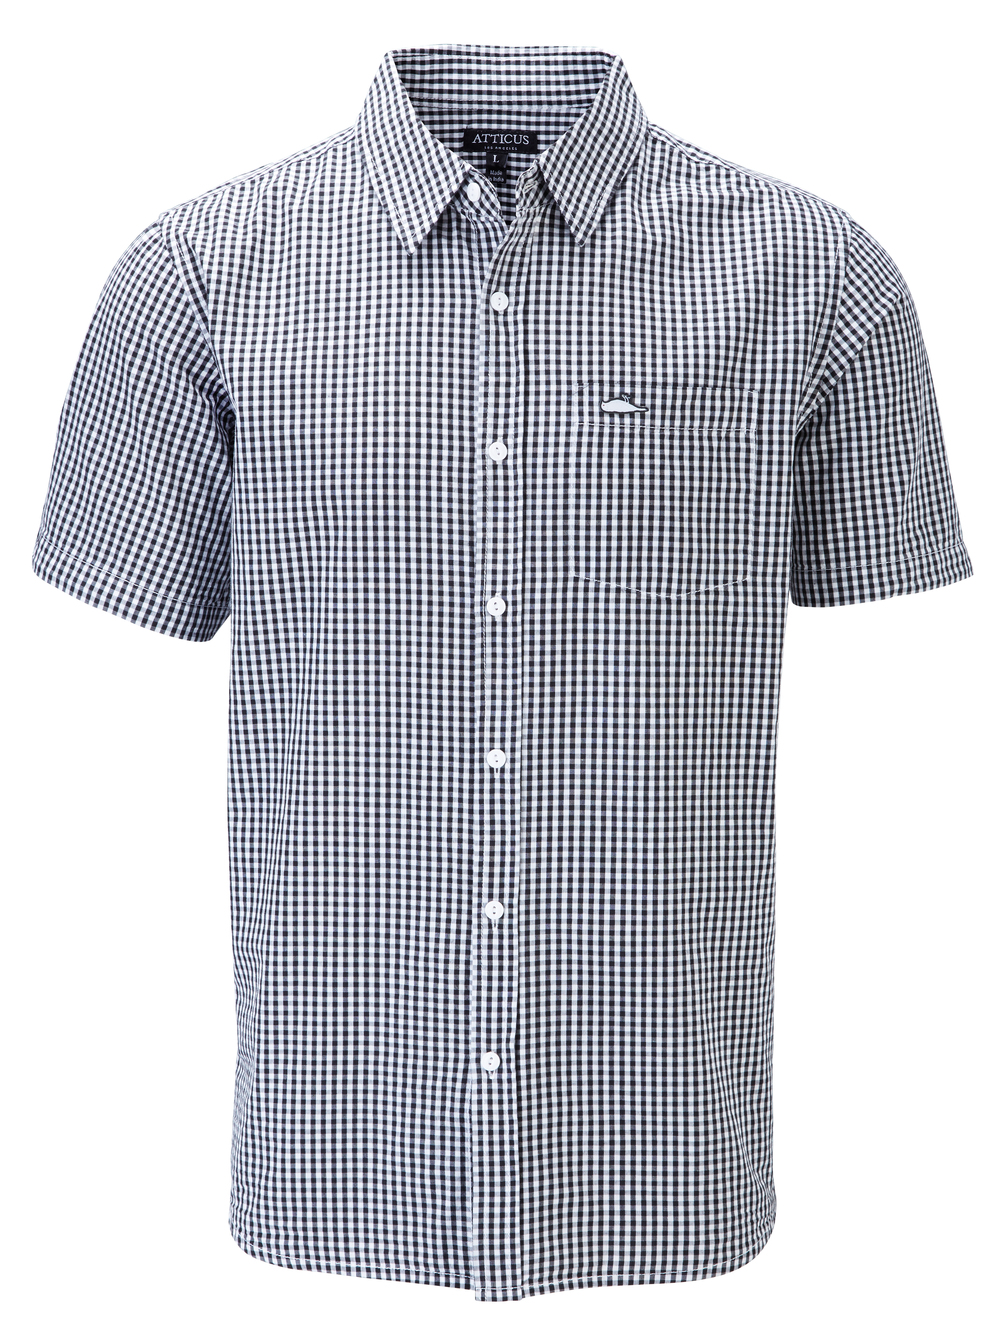 Atticus Shirt.jpg